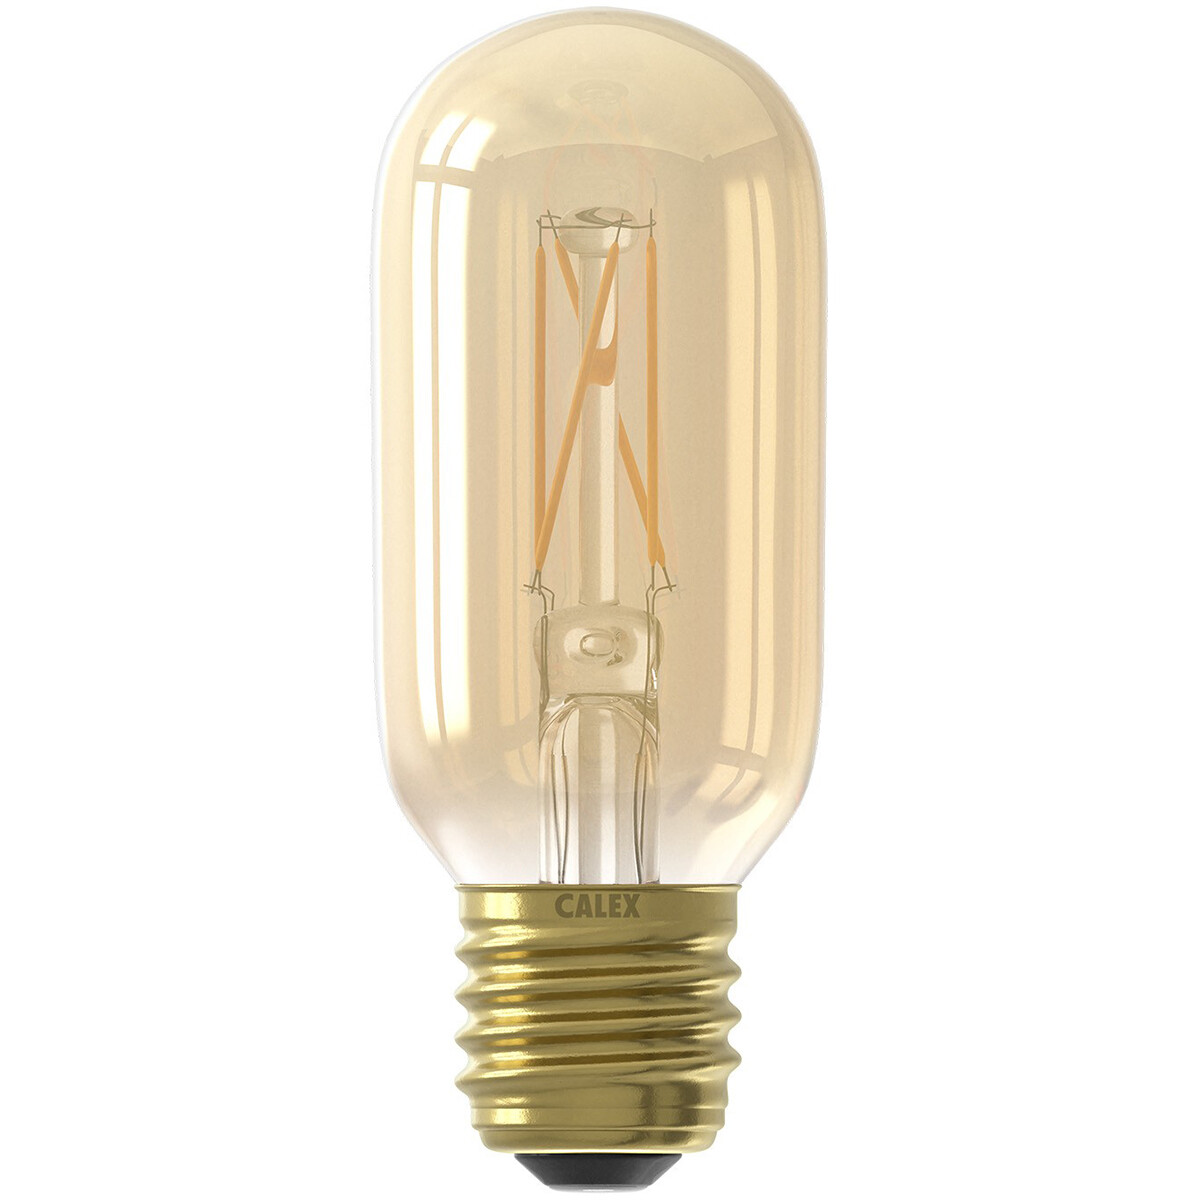 CALEX - LED Lamp - LED Buislamp - Filament T45 - E27 Fitting - Dimbaar - 4W - Warm Wit 2100K - Amber